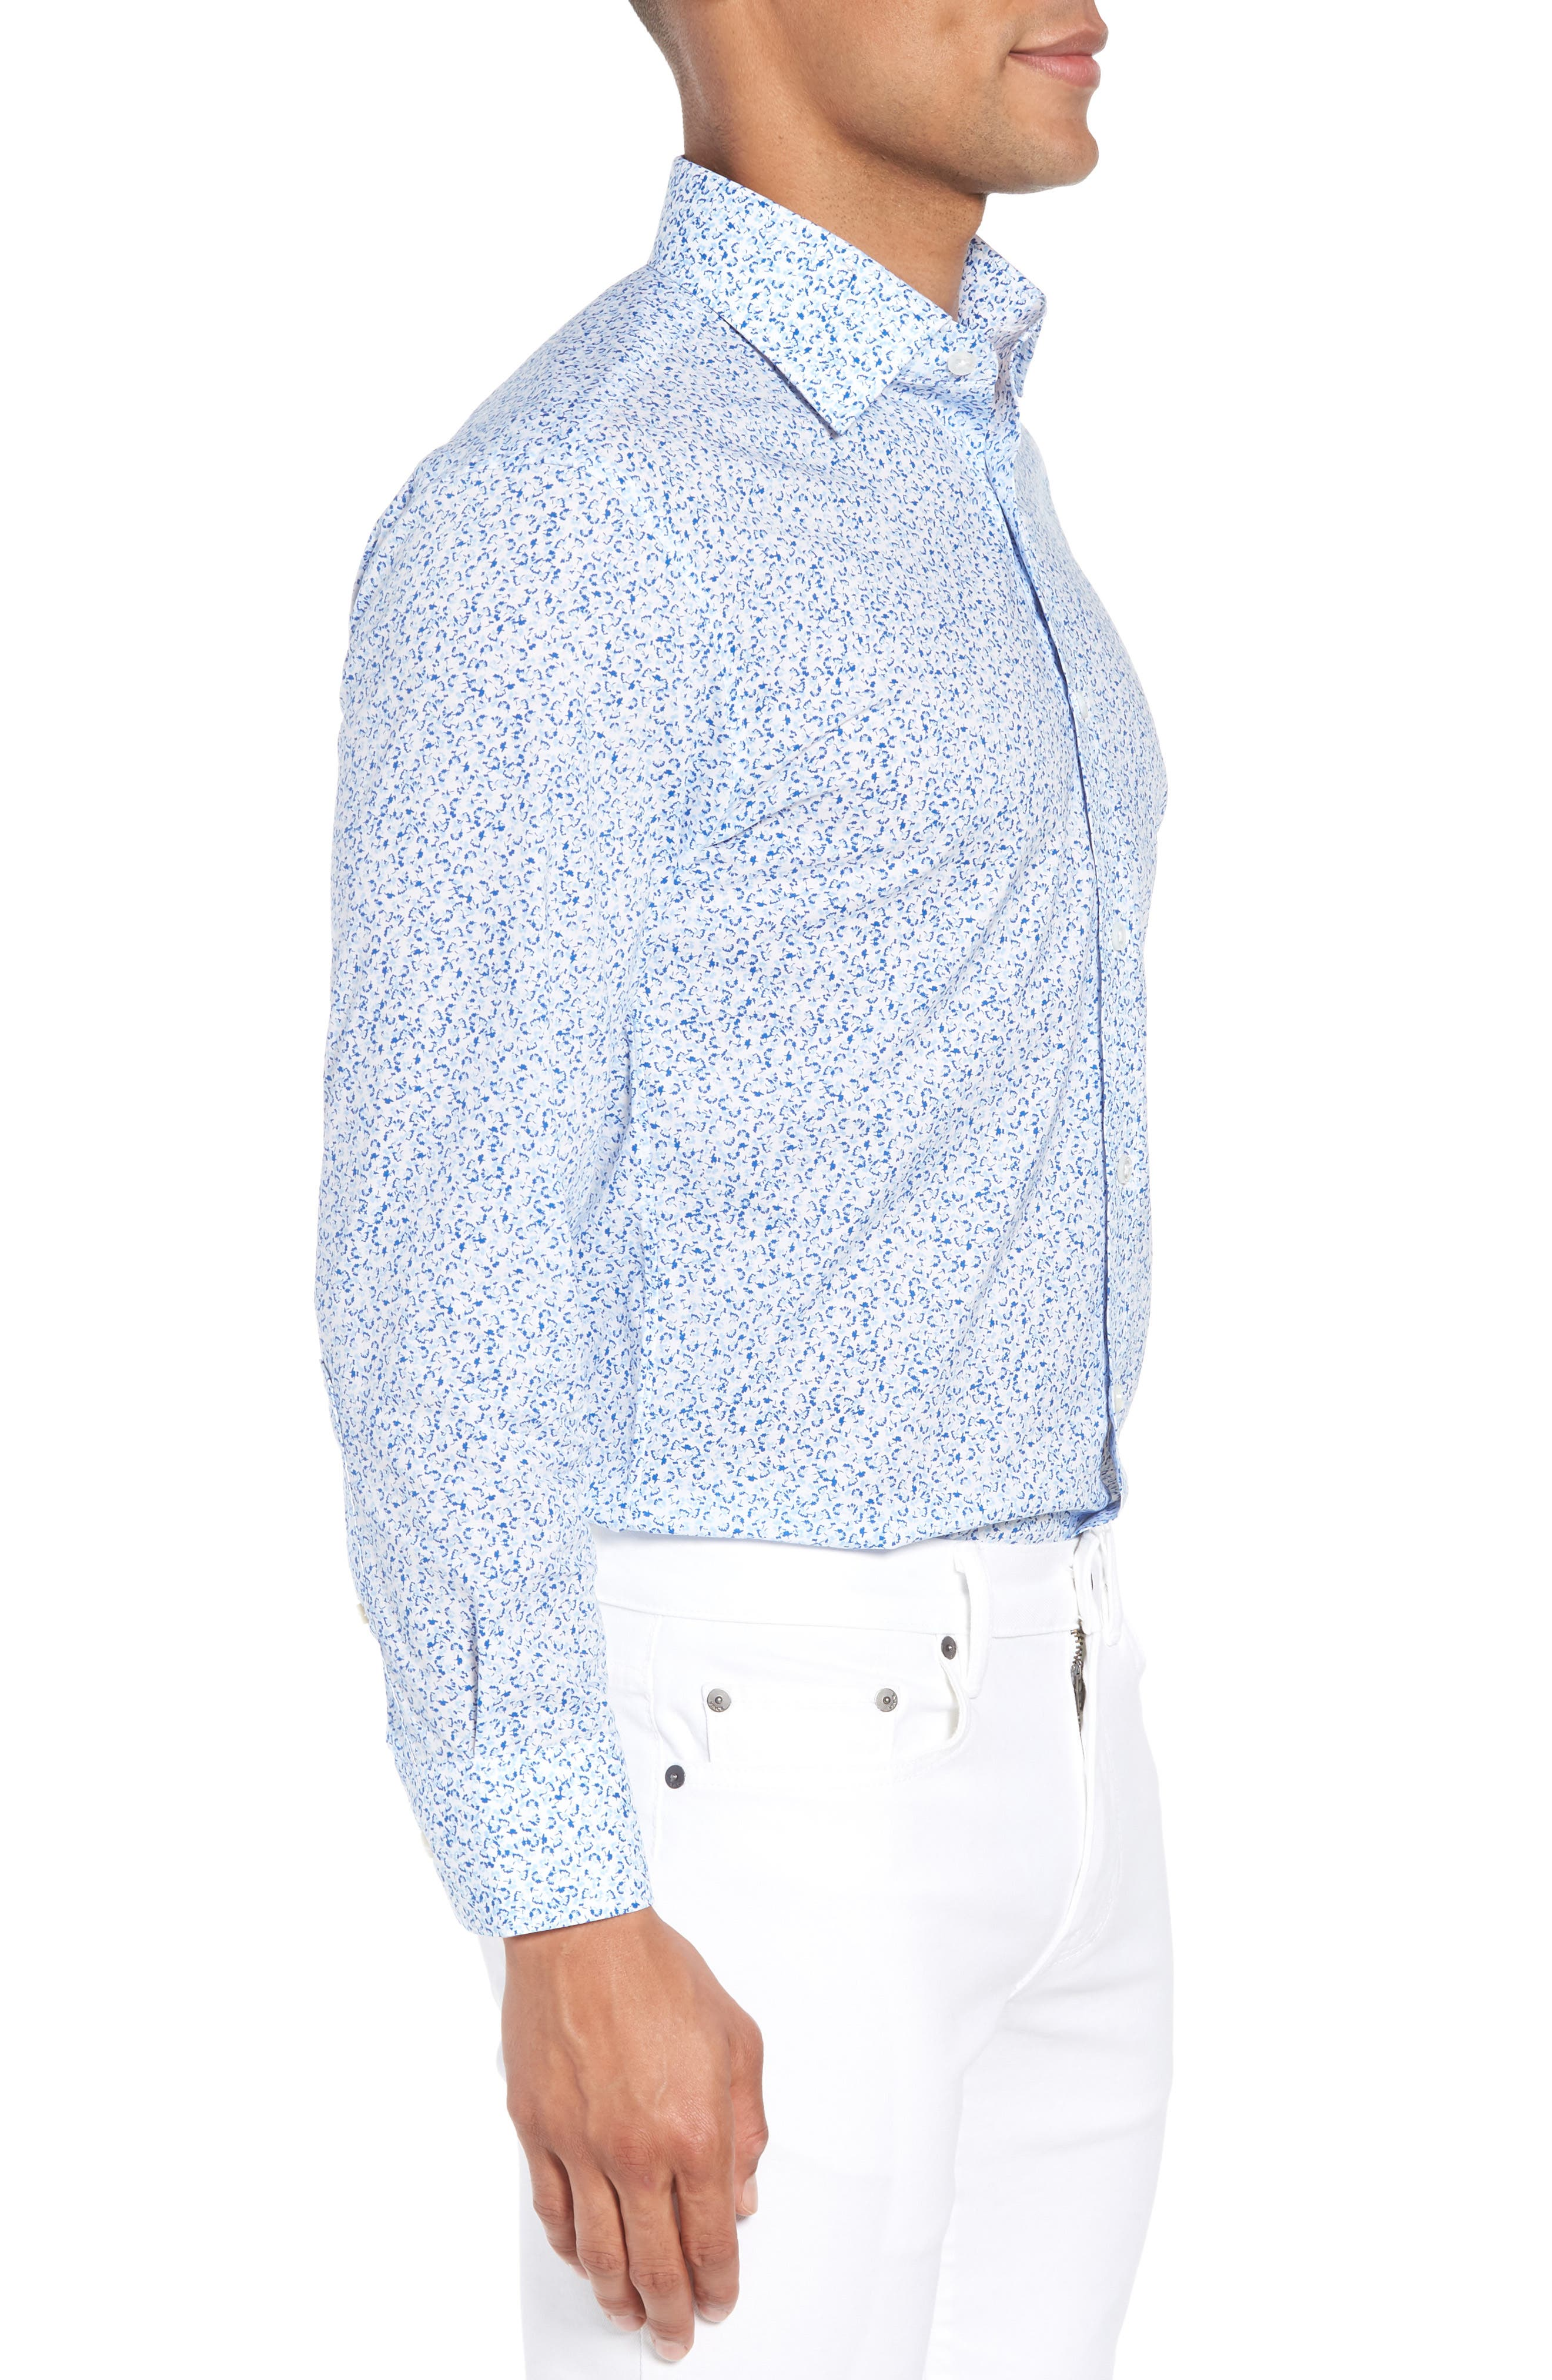 Jetsetter Slim Fit Floral Dress Shirt,                             Alternate thumbnail 4, color,                             Lapis Blue